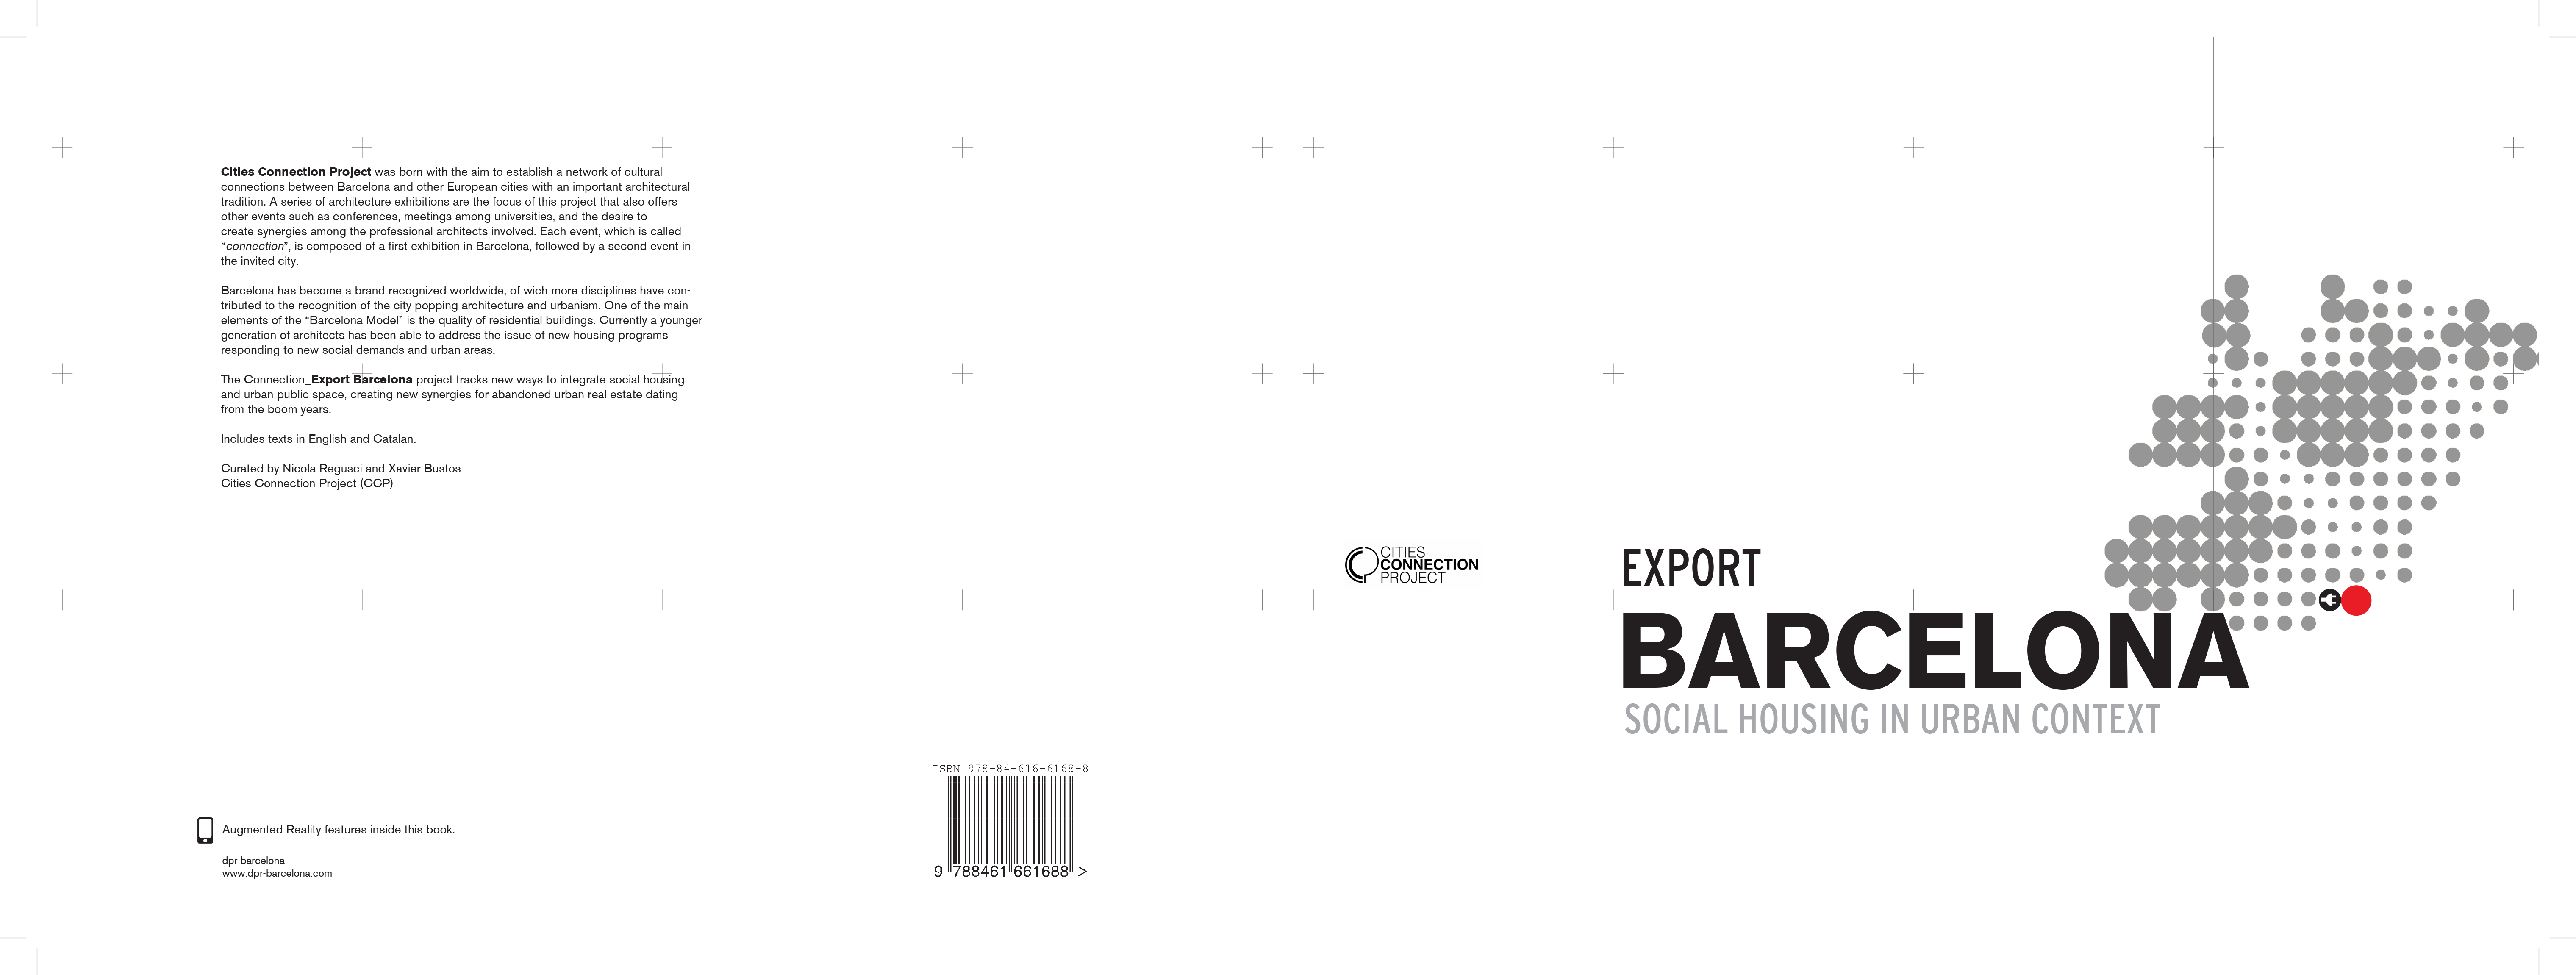 ExportBCN_02.indd